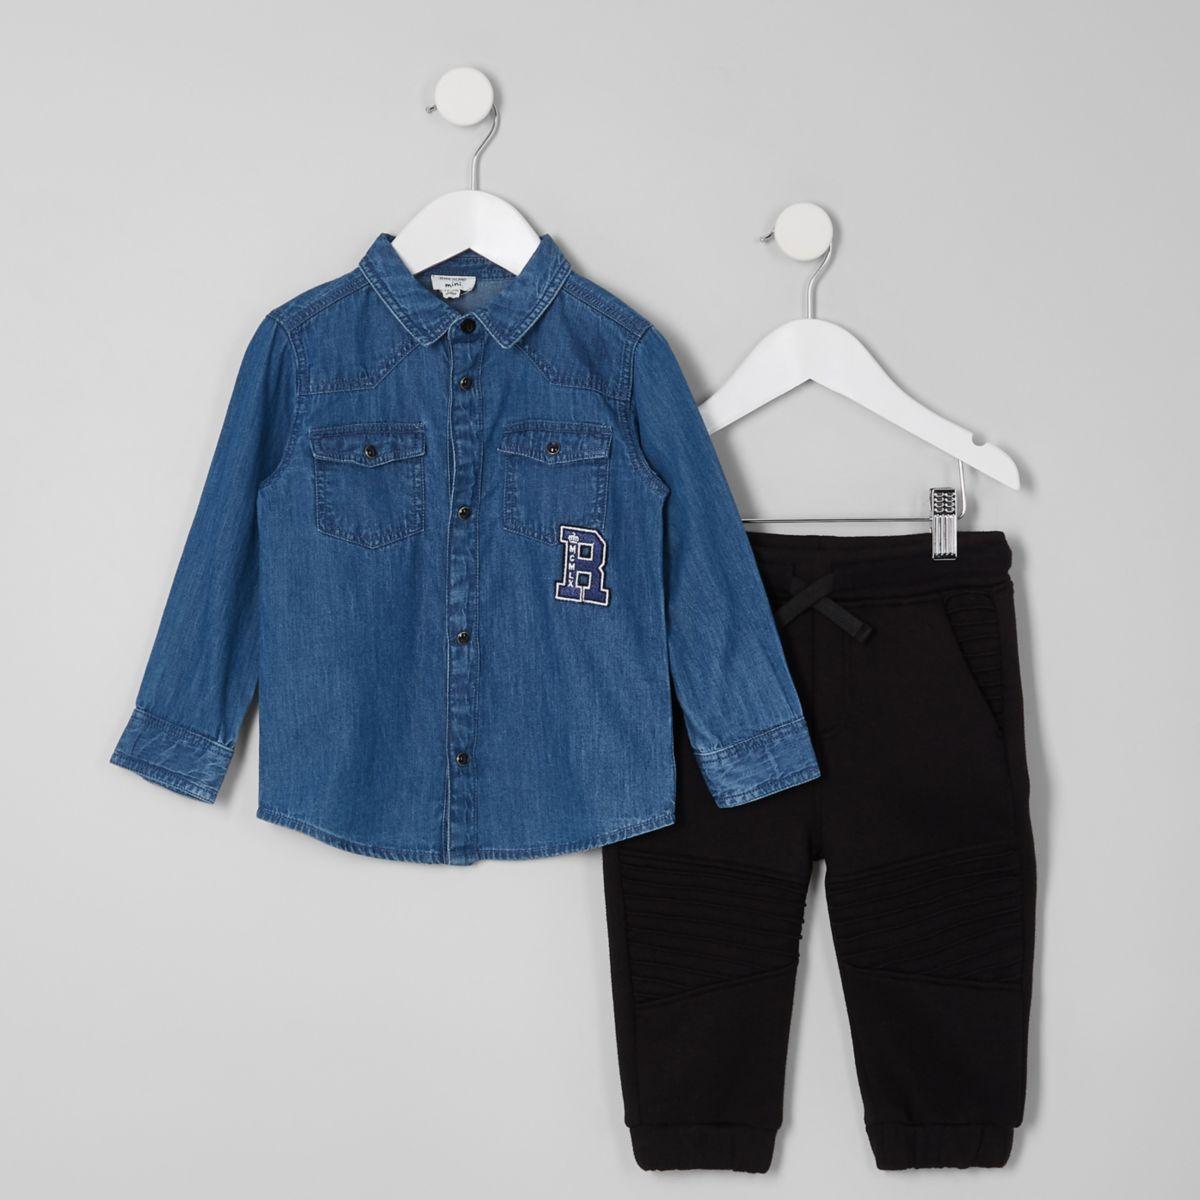 Mini boys blue denim shirt and jogger outfit